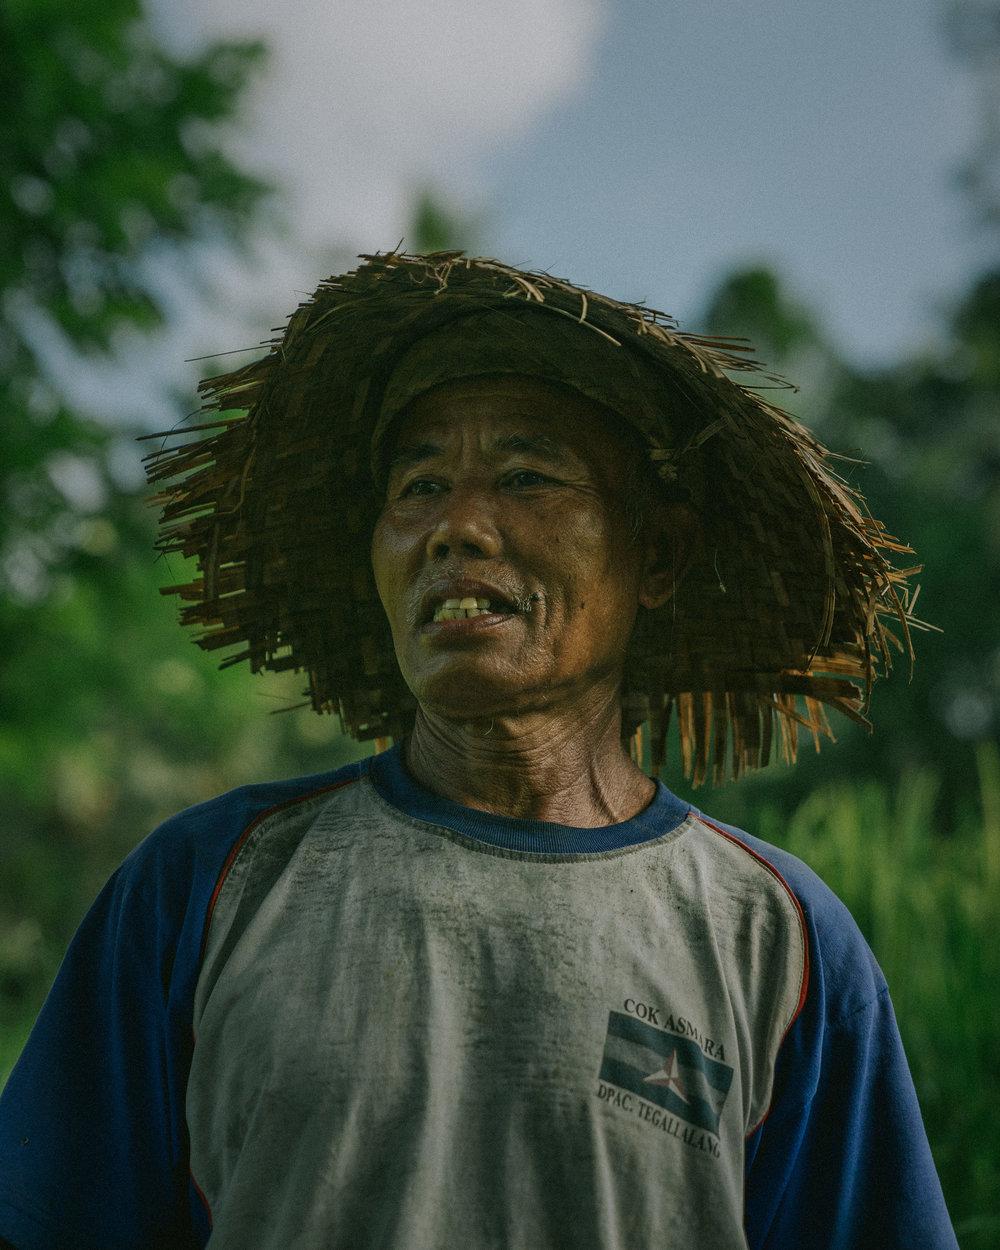 TEGALALANG: rice paddy worker.